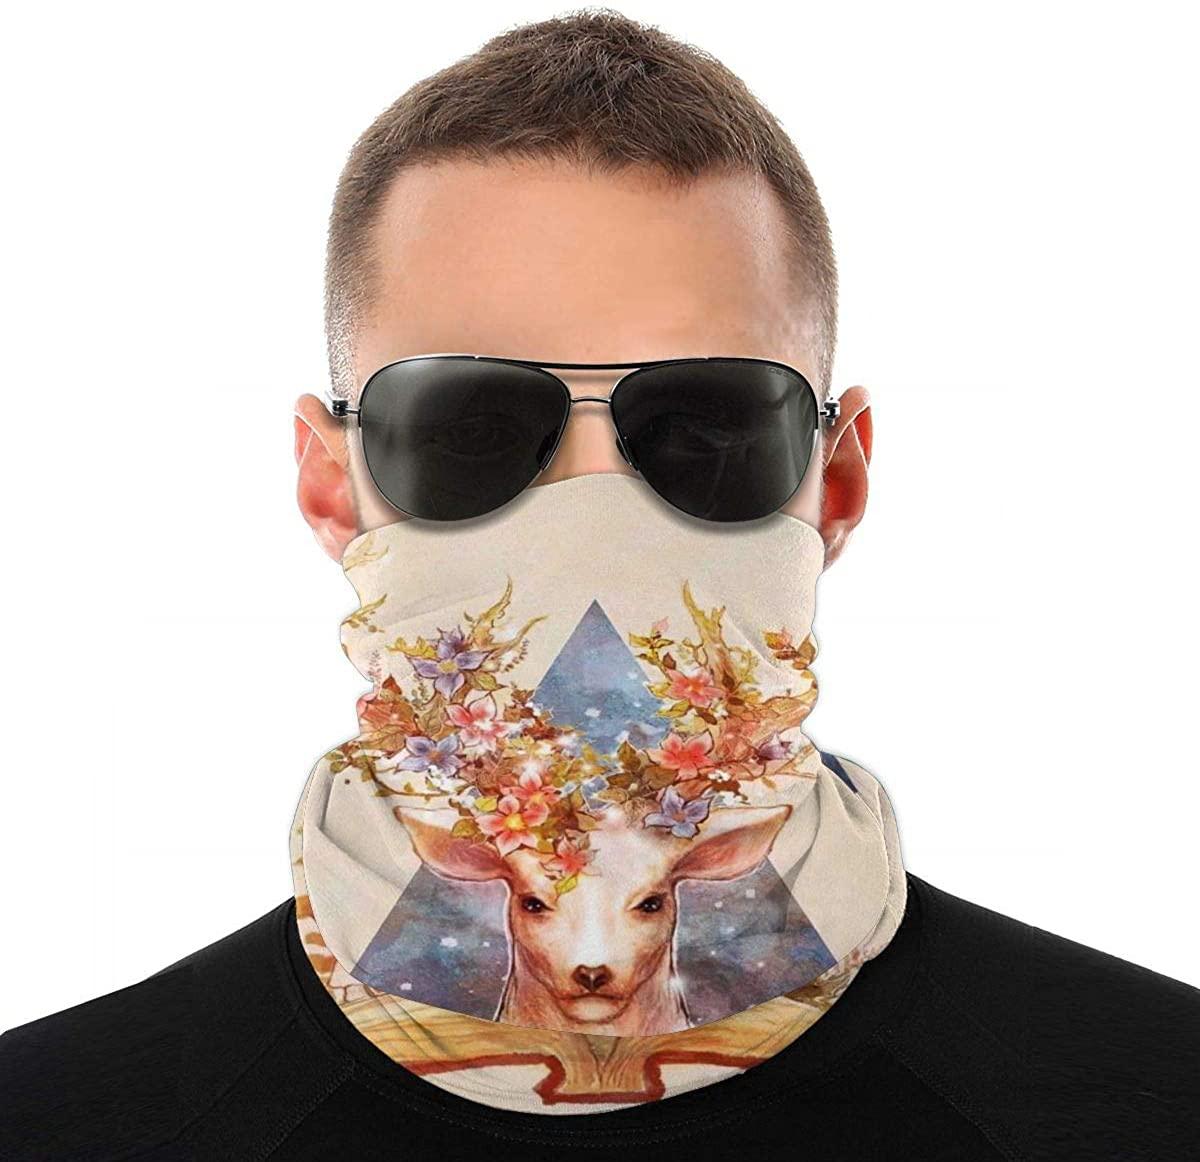 Reindeer David Deer Chinese Fantasy Book Novelty Neck Gaiter Unisex Adult Windproof Mask Dust Sports Face Mask Half Balaclava Weather Bandana Women Men Outdoors Festivals